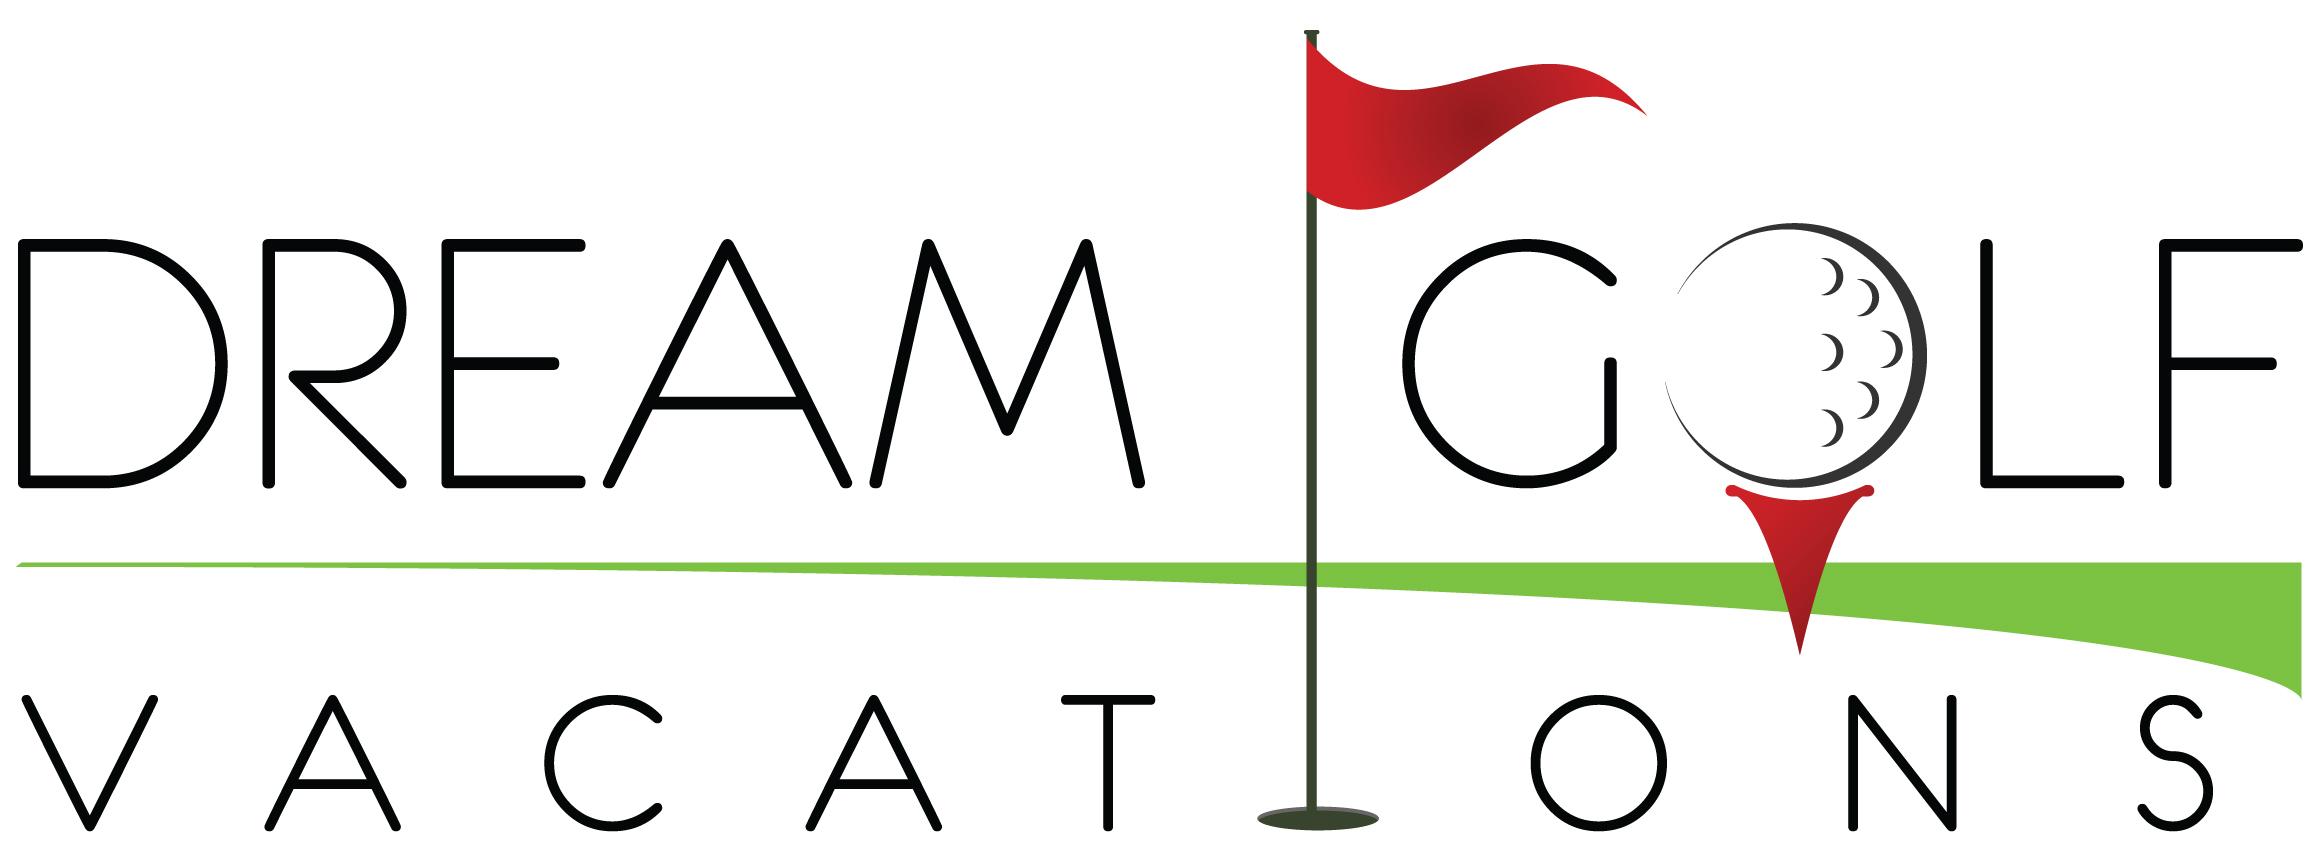 Dream Golf Vacations Q3 '18's Logo